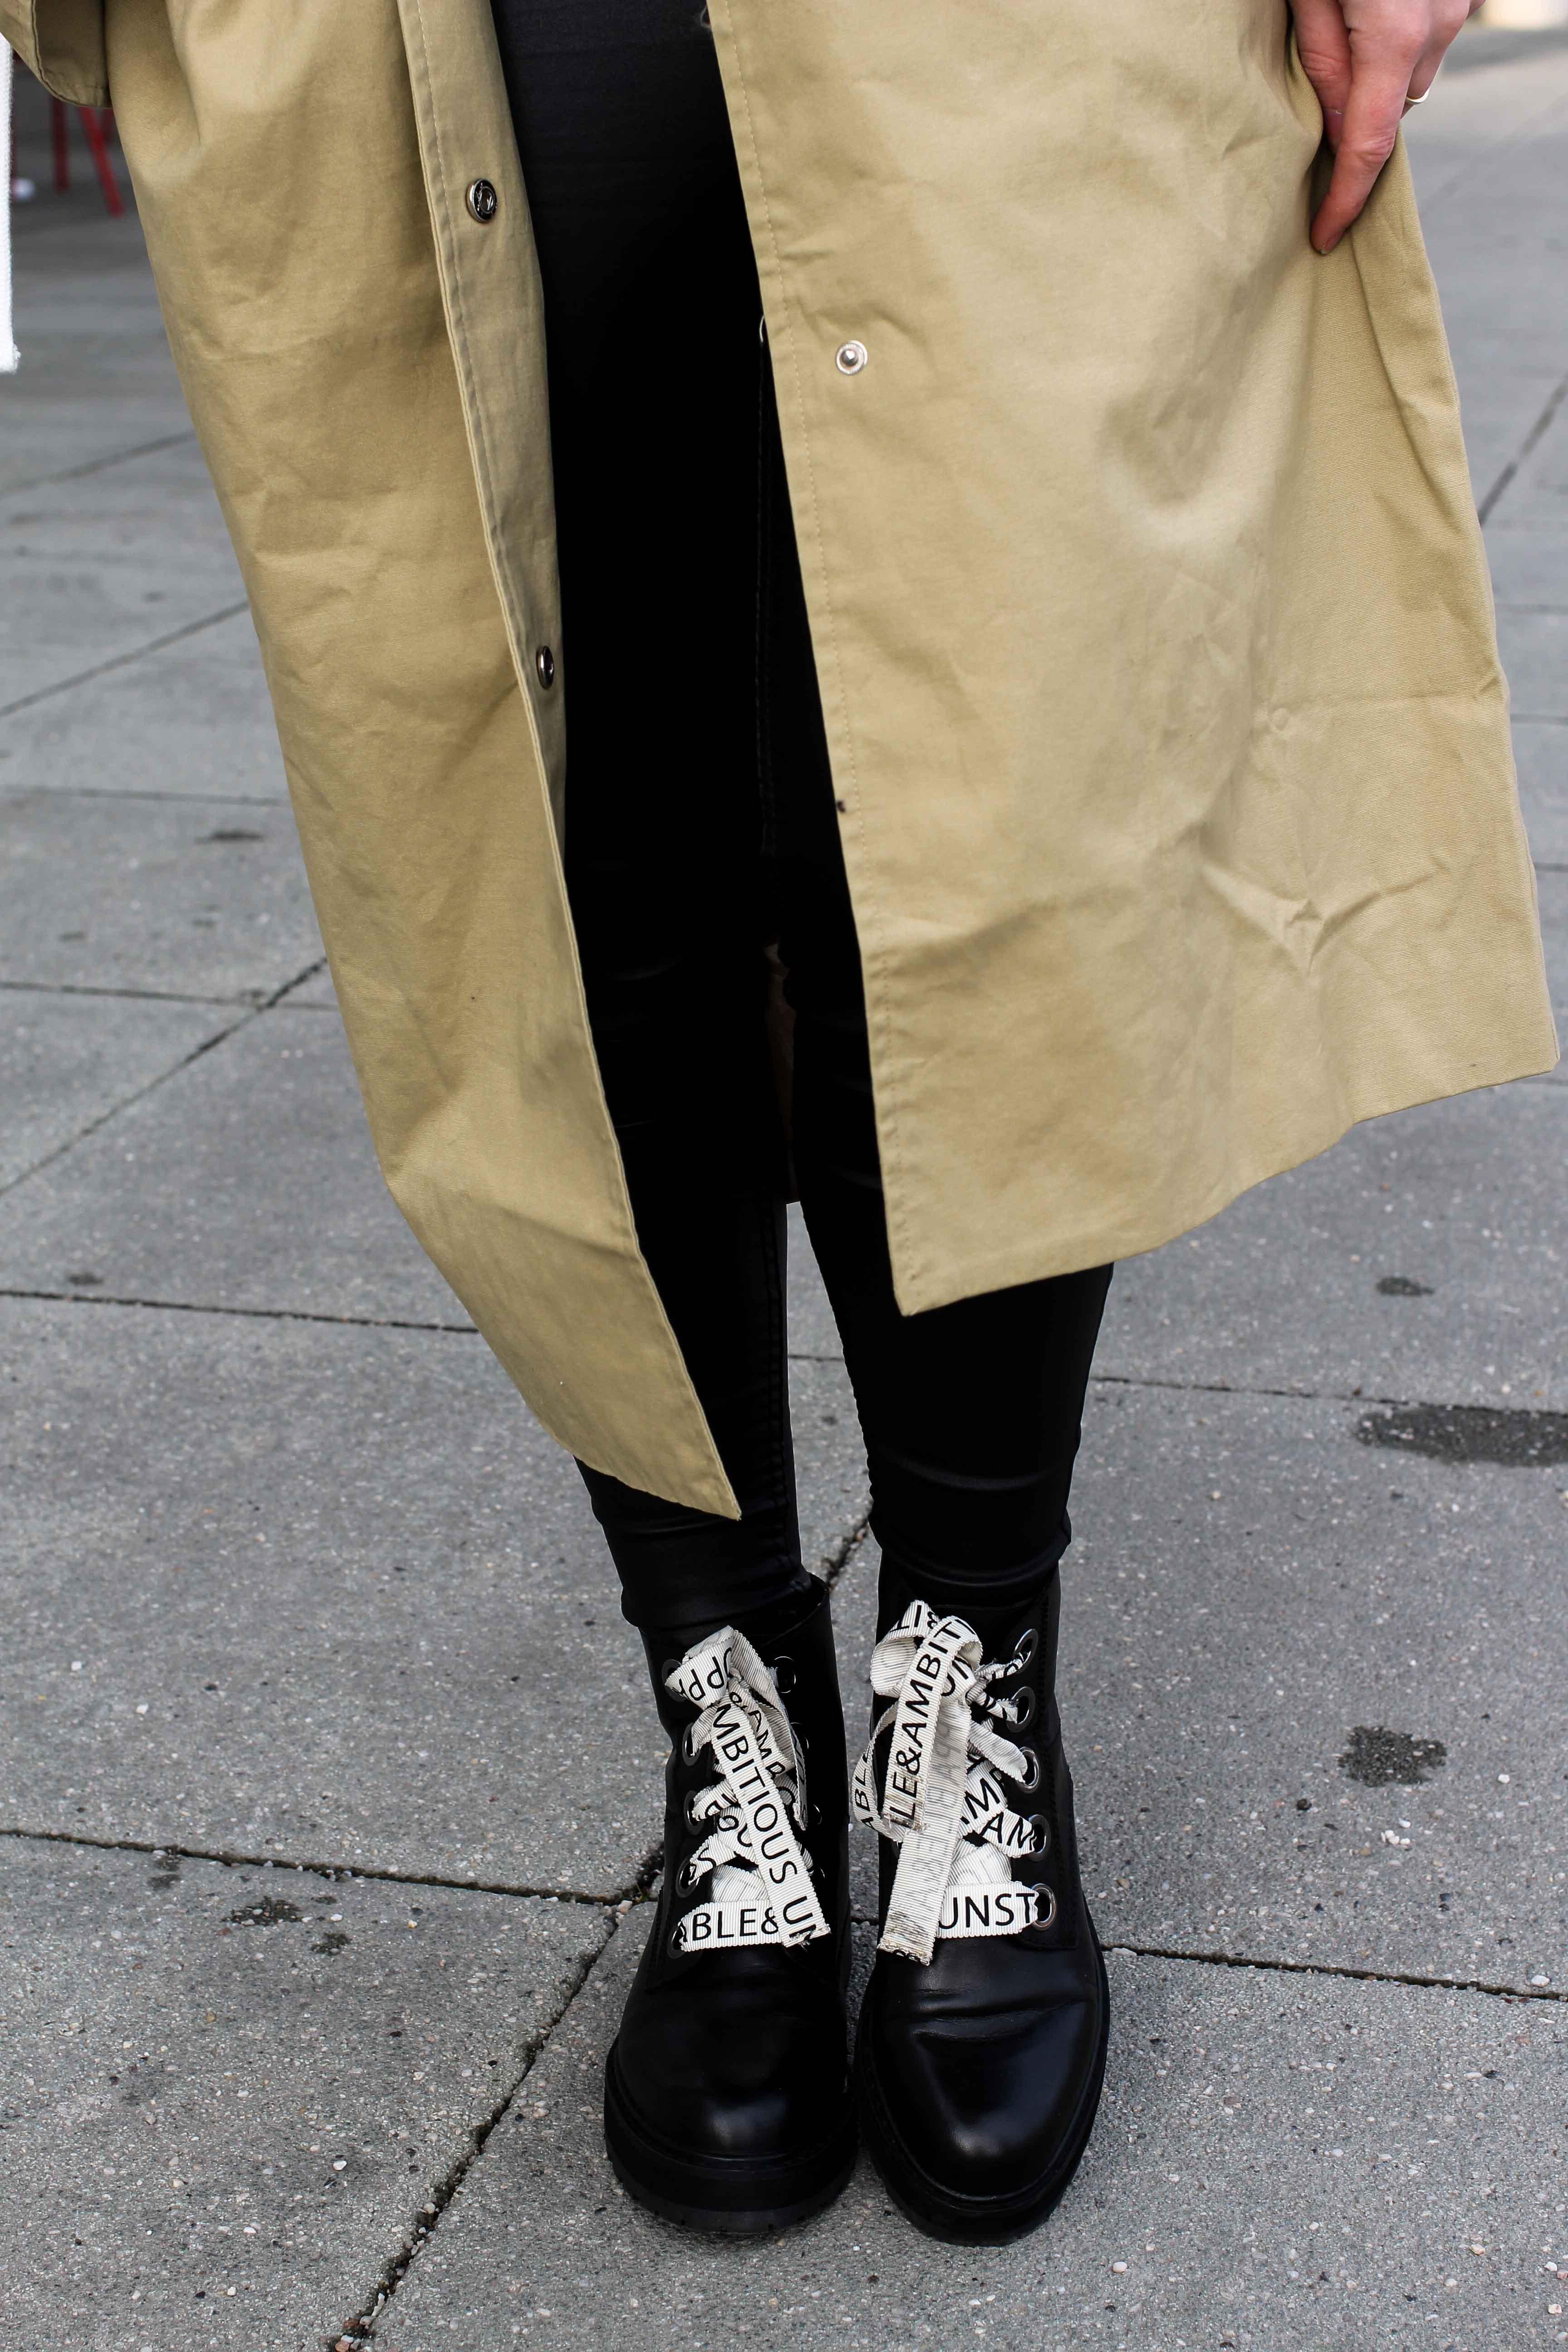 Trenchcoat Edited Marisa Details Schnürboots Zara Modeblog Bonn Trenchcoat kombinieren Streetstyle Fashion Blog